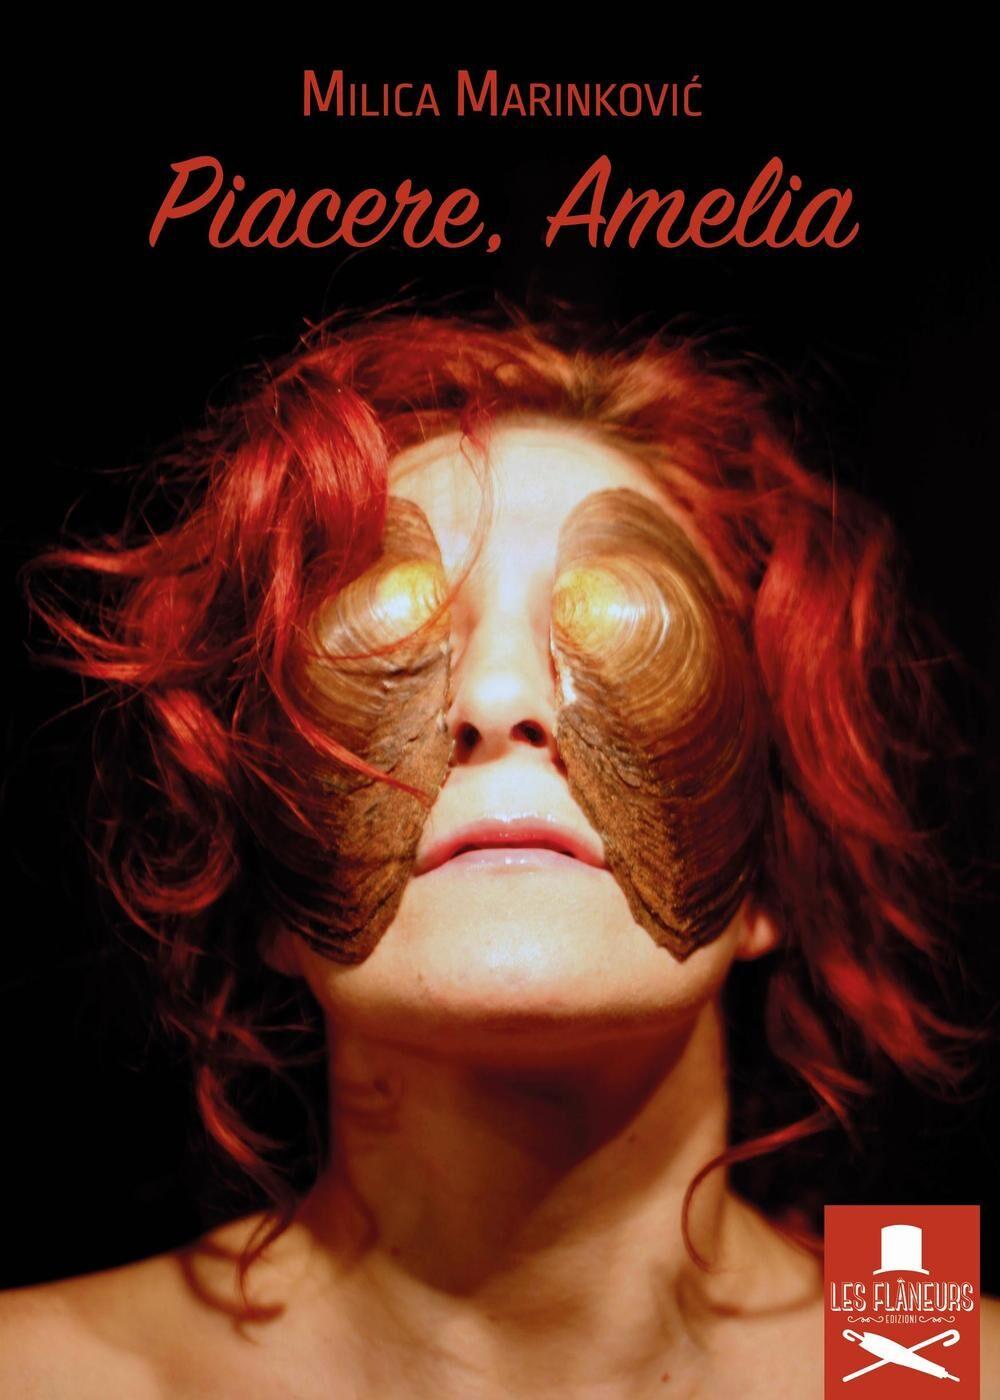 Piacere, Amelia